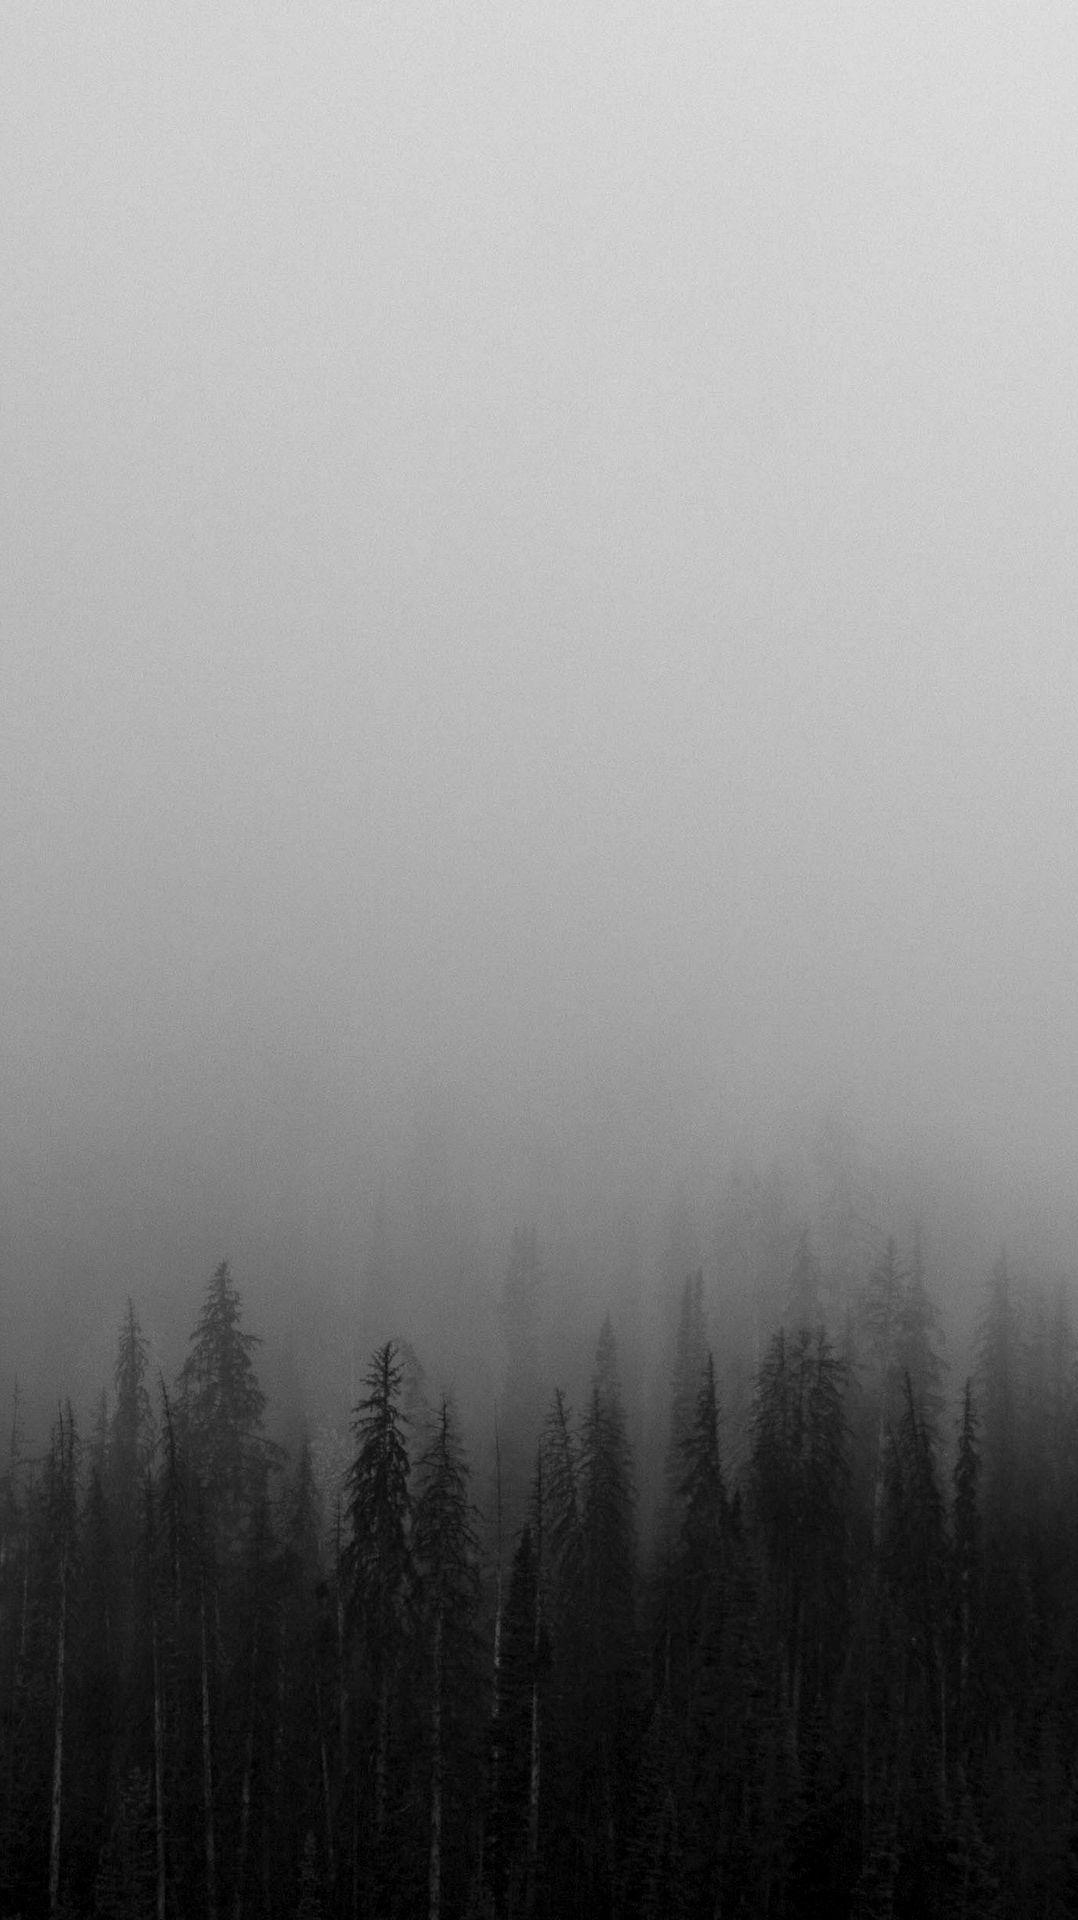 Dark Forest Iphone Wallpaper : forest, iphone, wallpaper, Black-and-White-Mist-Forests-Wallpaper, Wallpaper, Iphone,, Forest, Black, White, Iphone